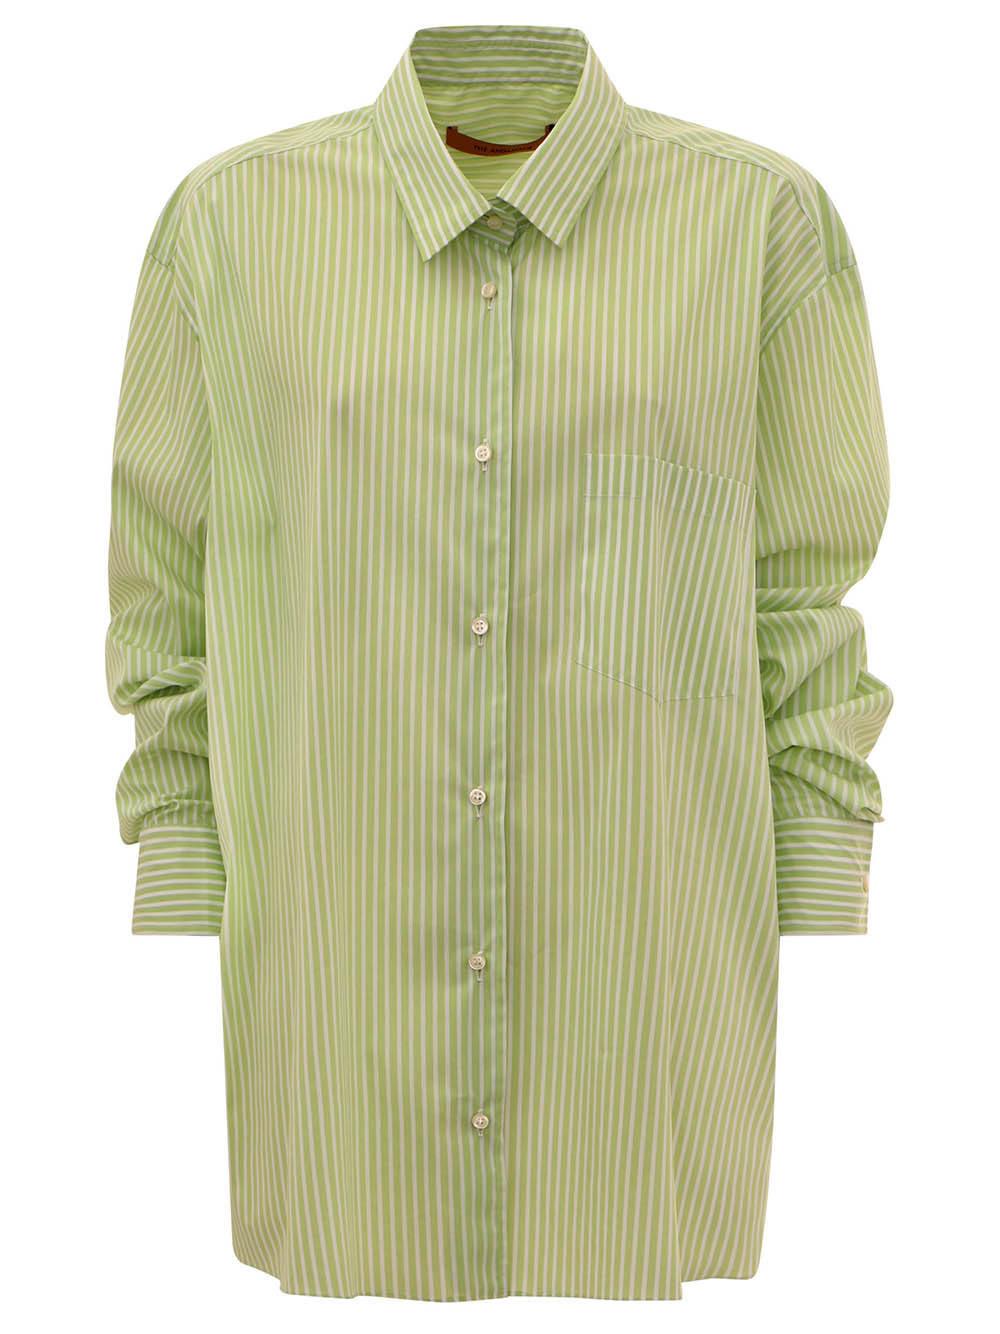 Georgia Classic Shirt Item # T090903A